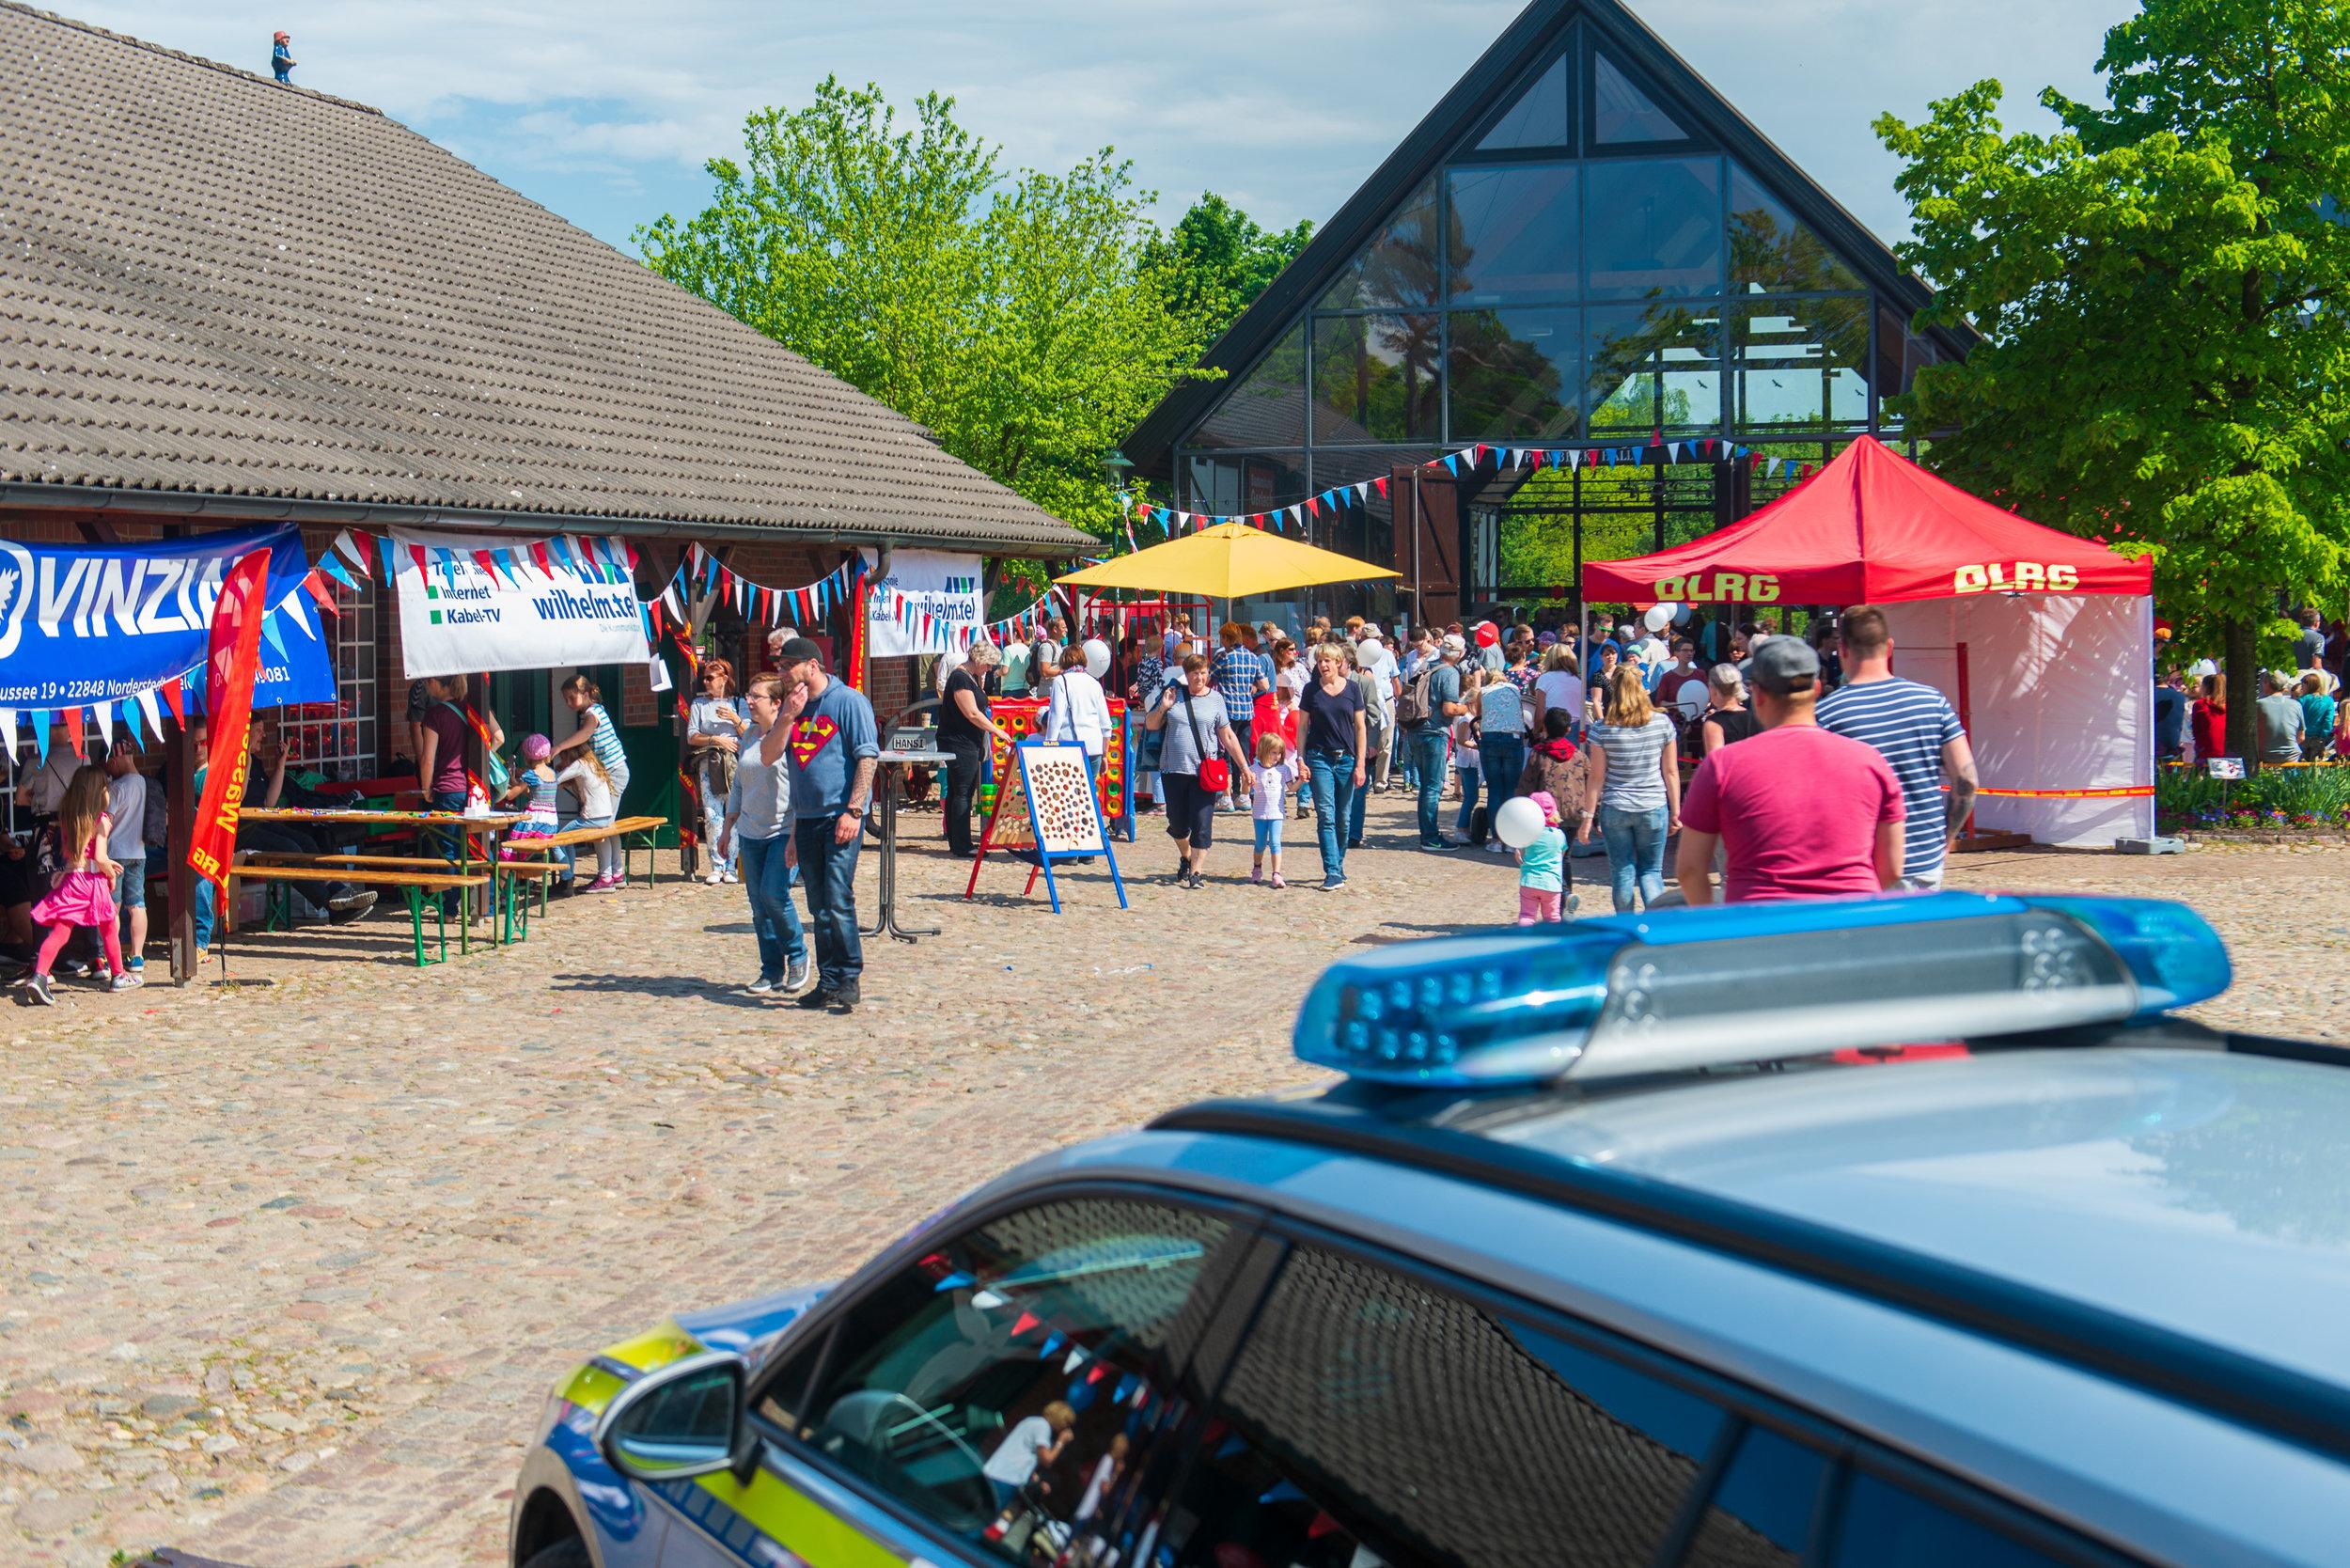 13-Norderstedter-Museumsfest-2019-FWM--XO-Dennys-Mamero-WEB-16.jpg